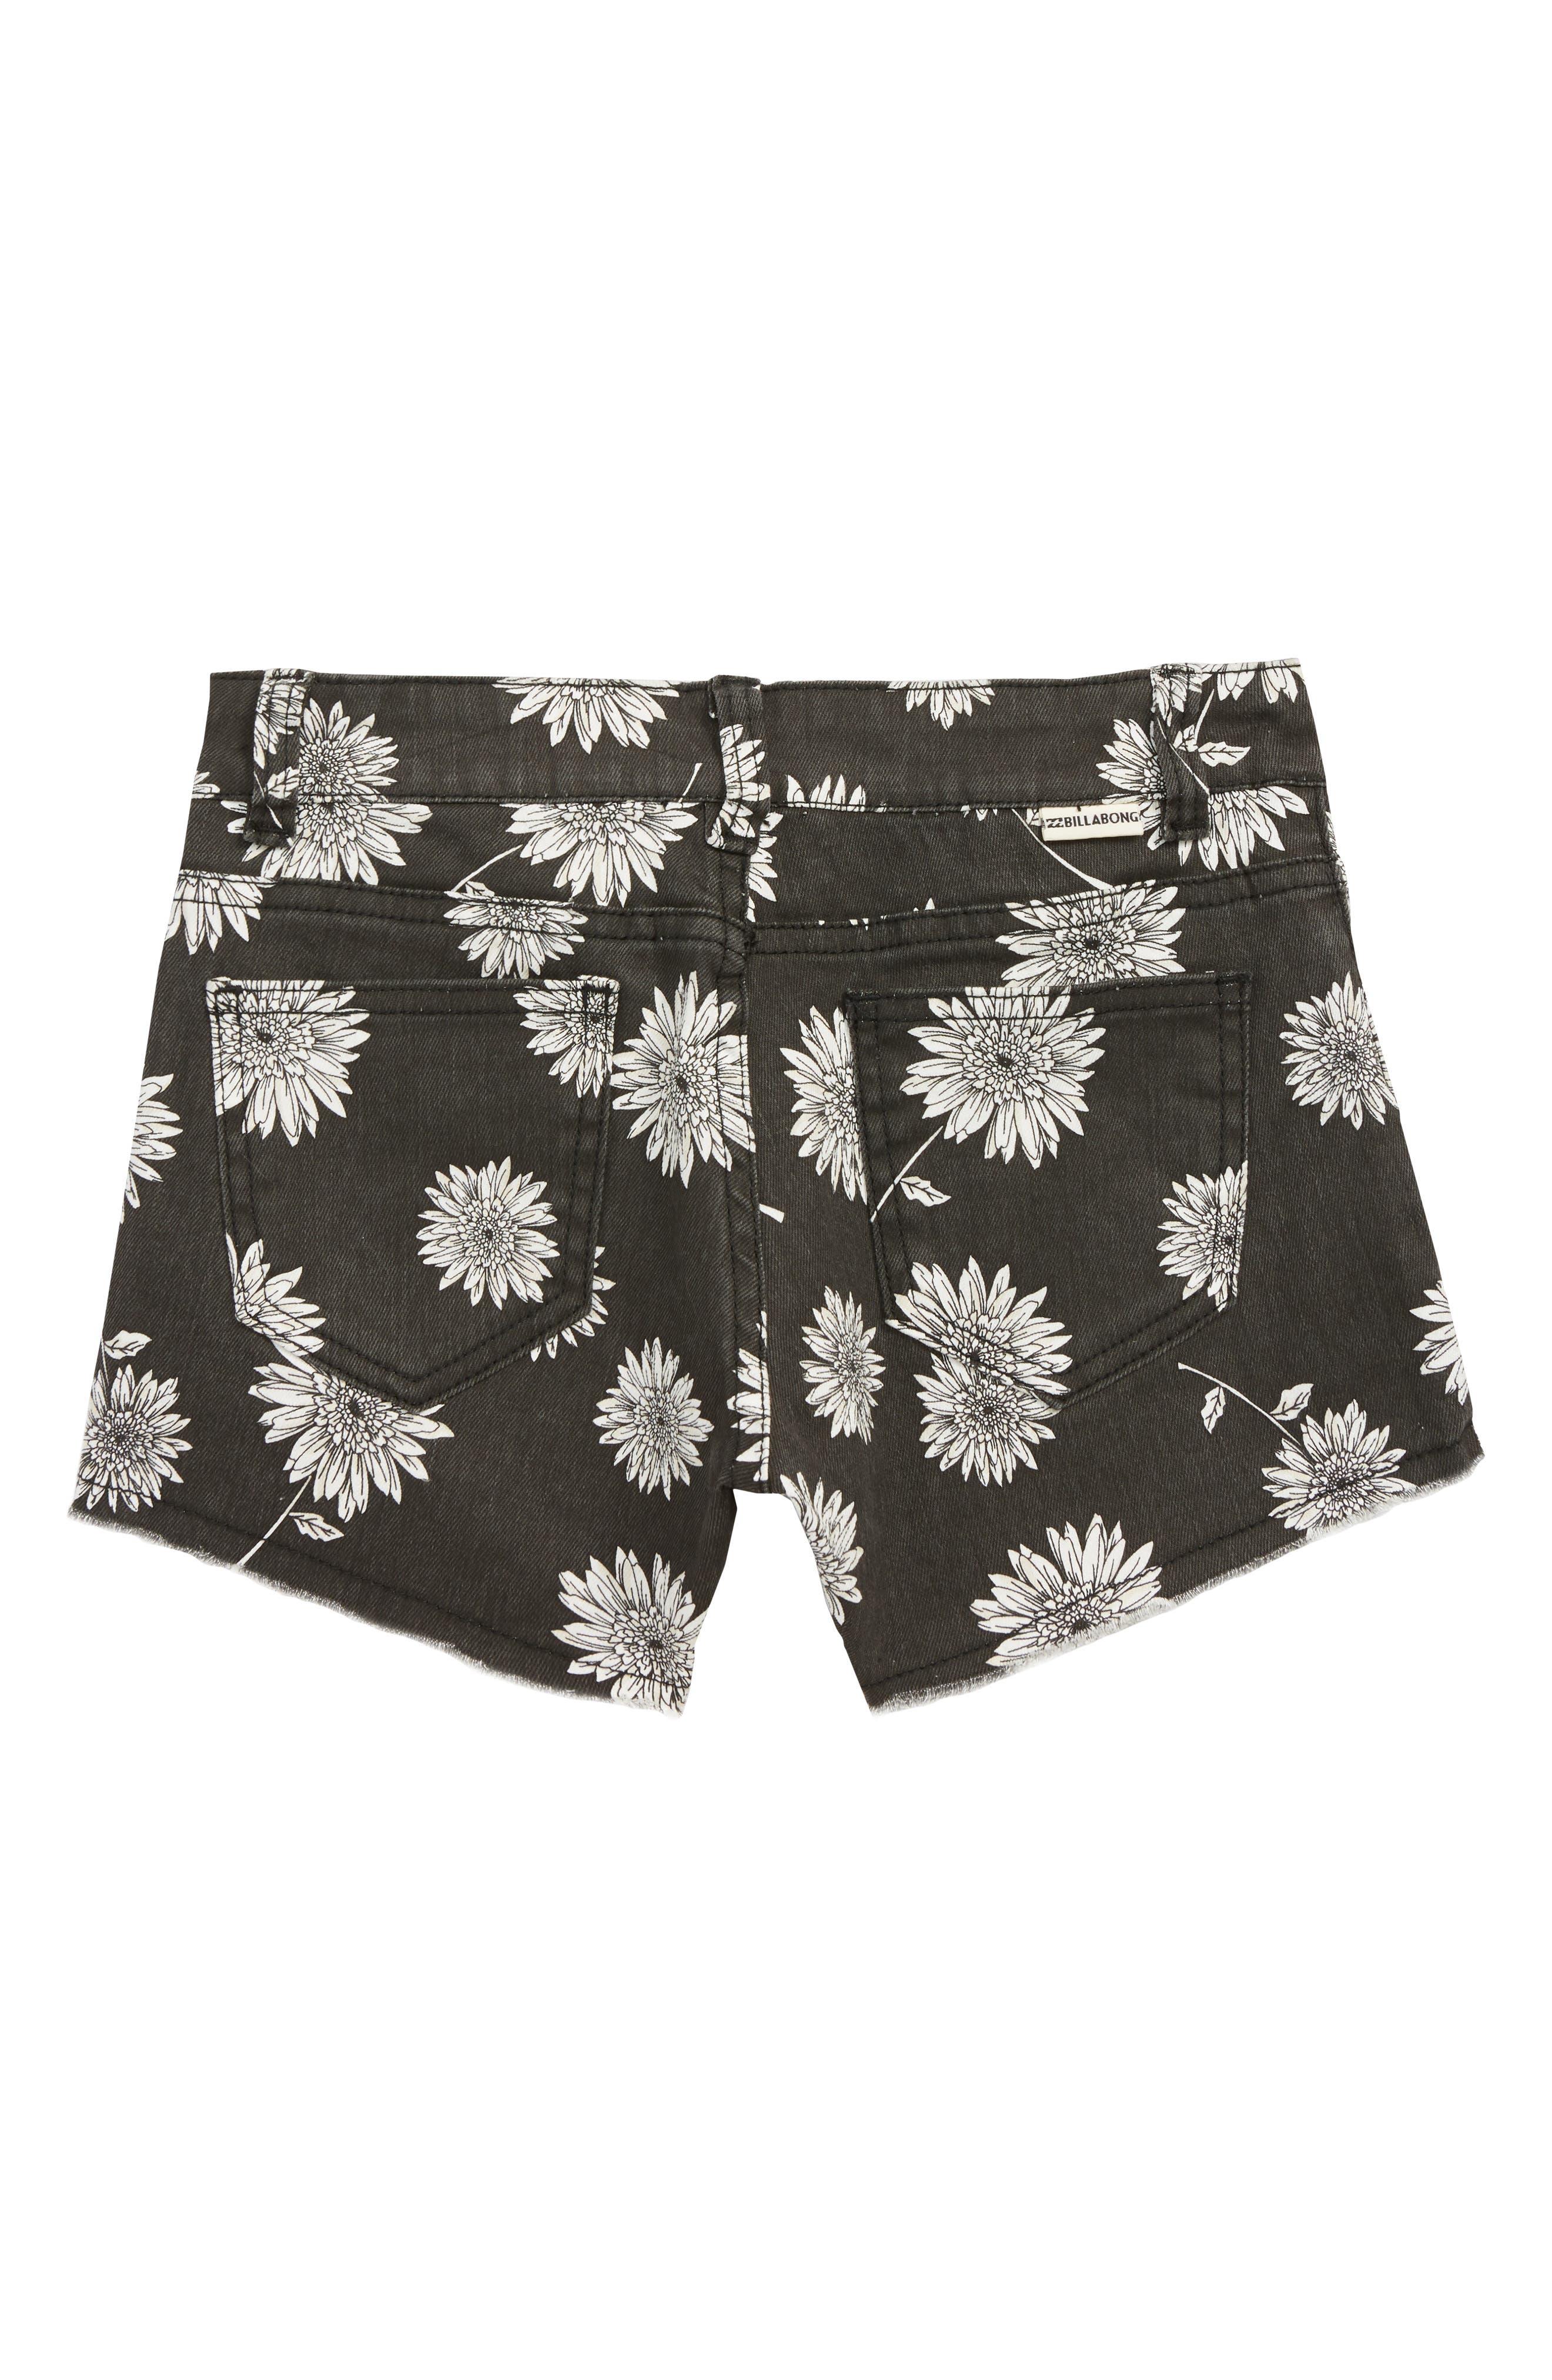 Buttoned Up Denim Shorts,                             Alternate thumbnail 2, color,                             001